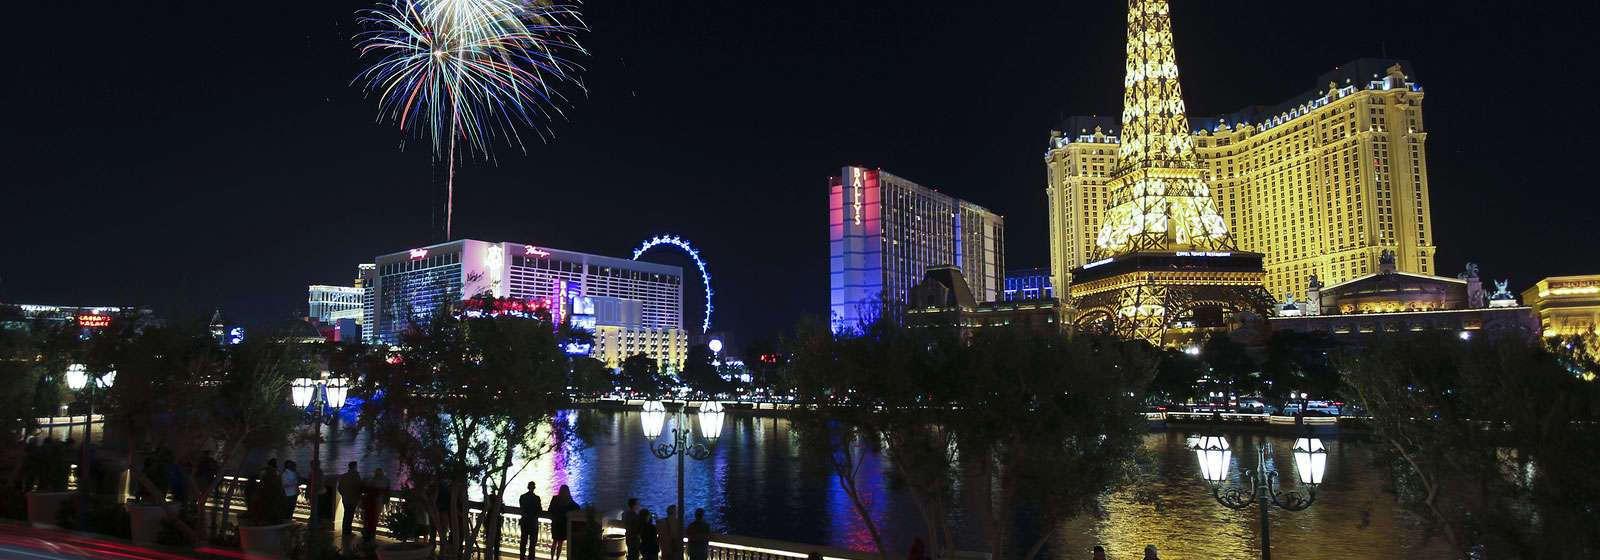 May Calendar Vegas : Las vegas july concerts shows events club calendar